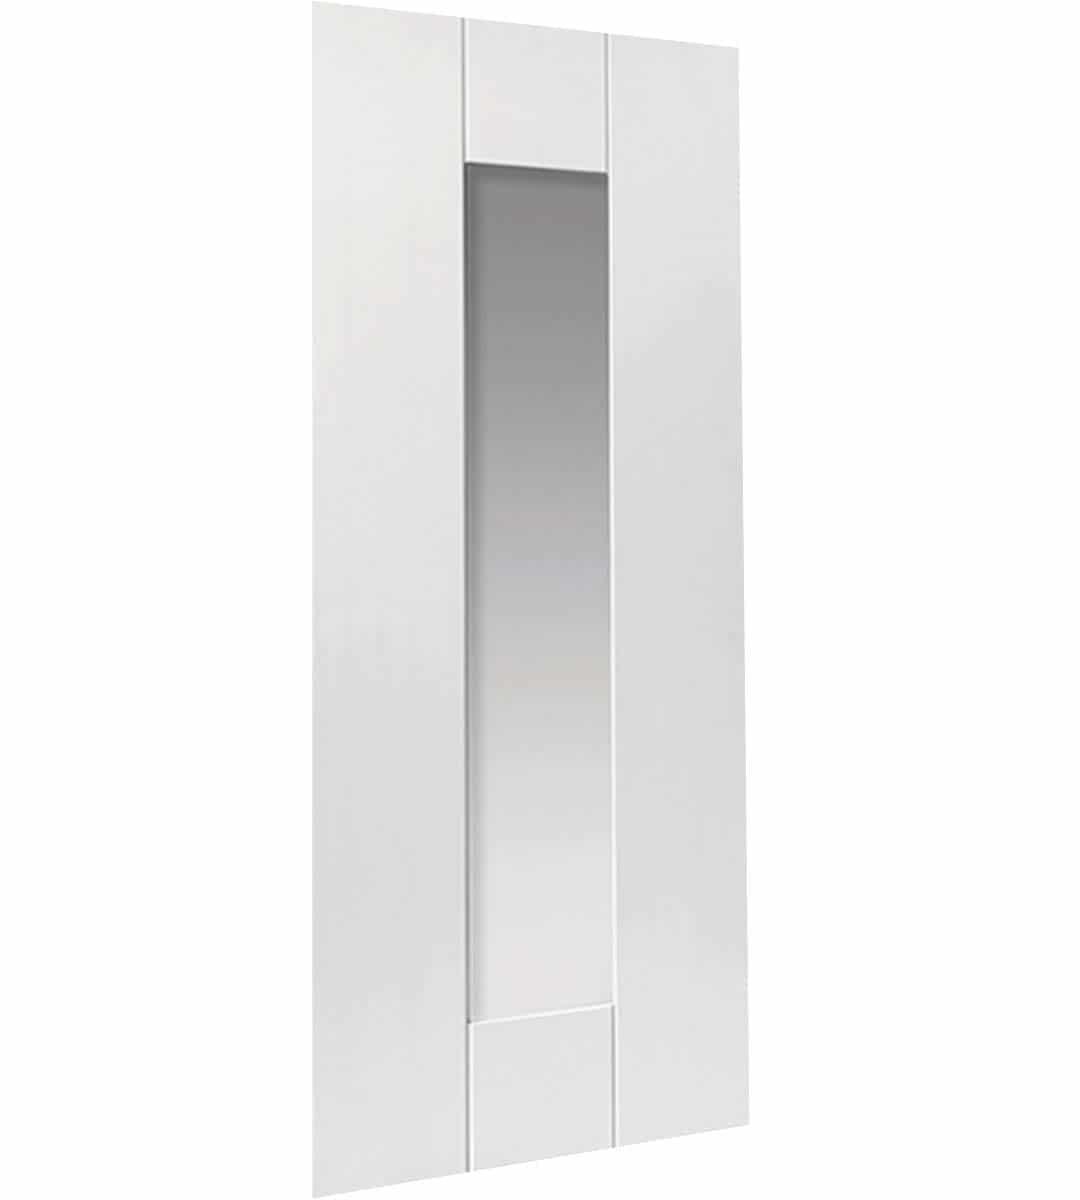 Axis Interior White Glass Door